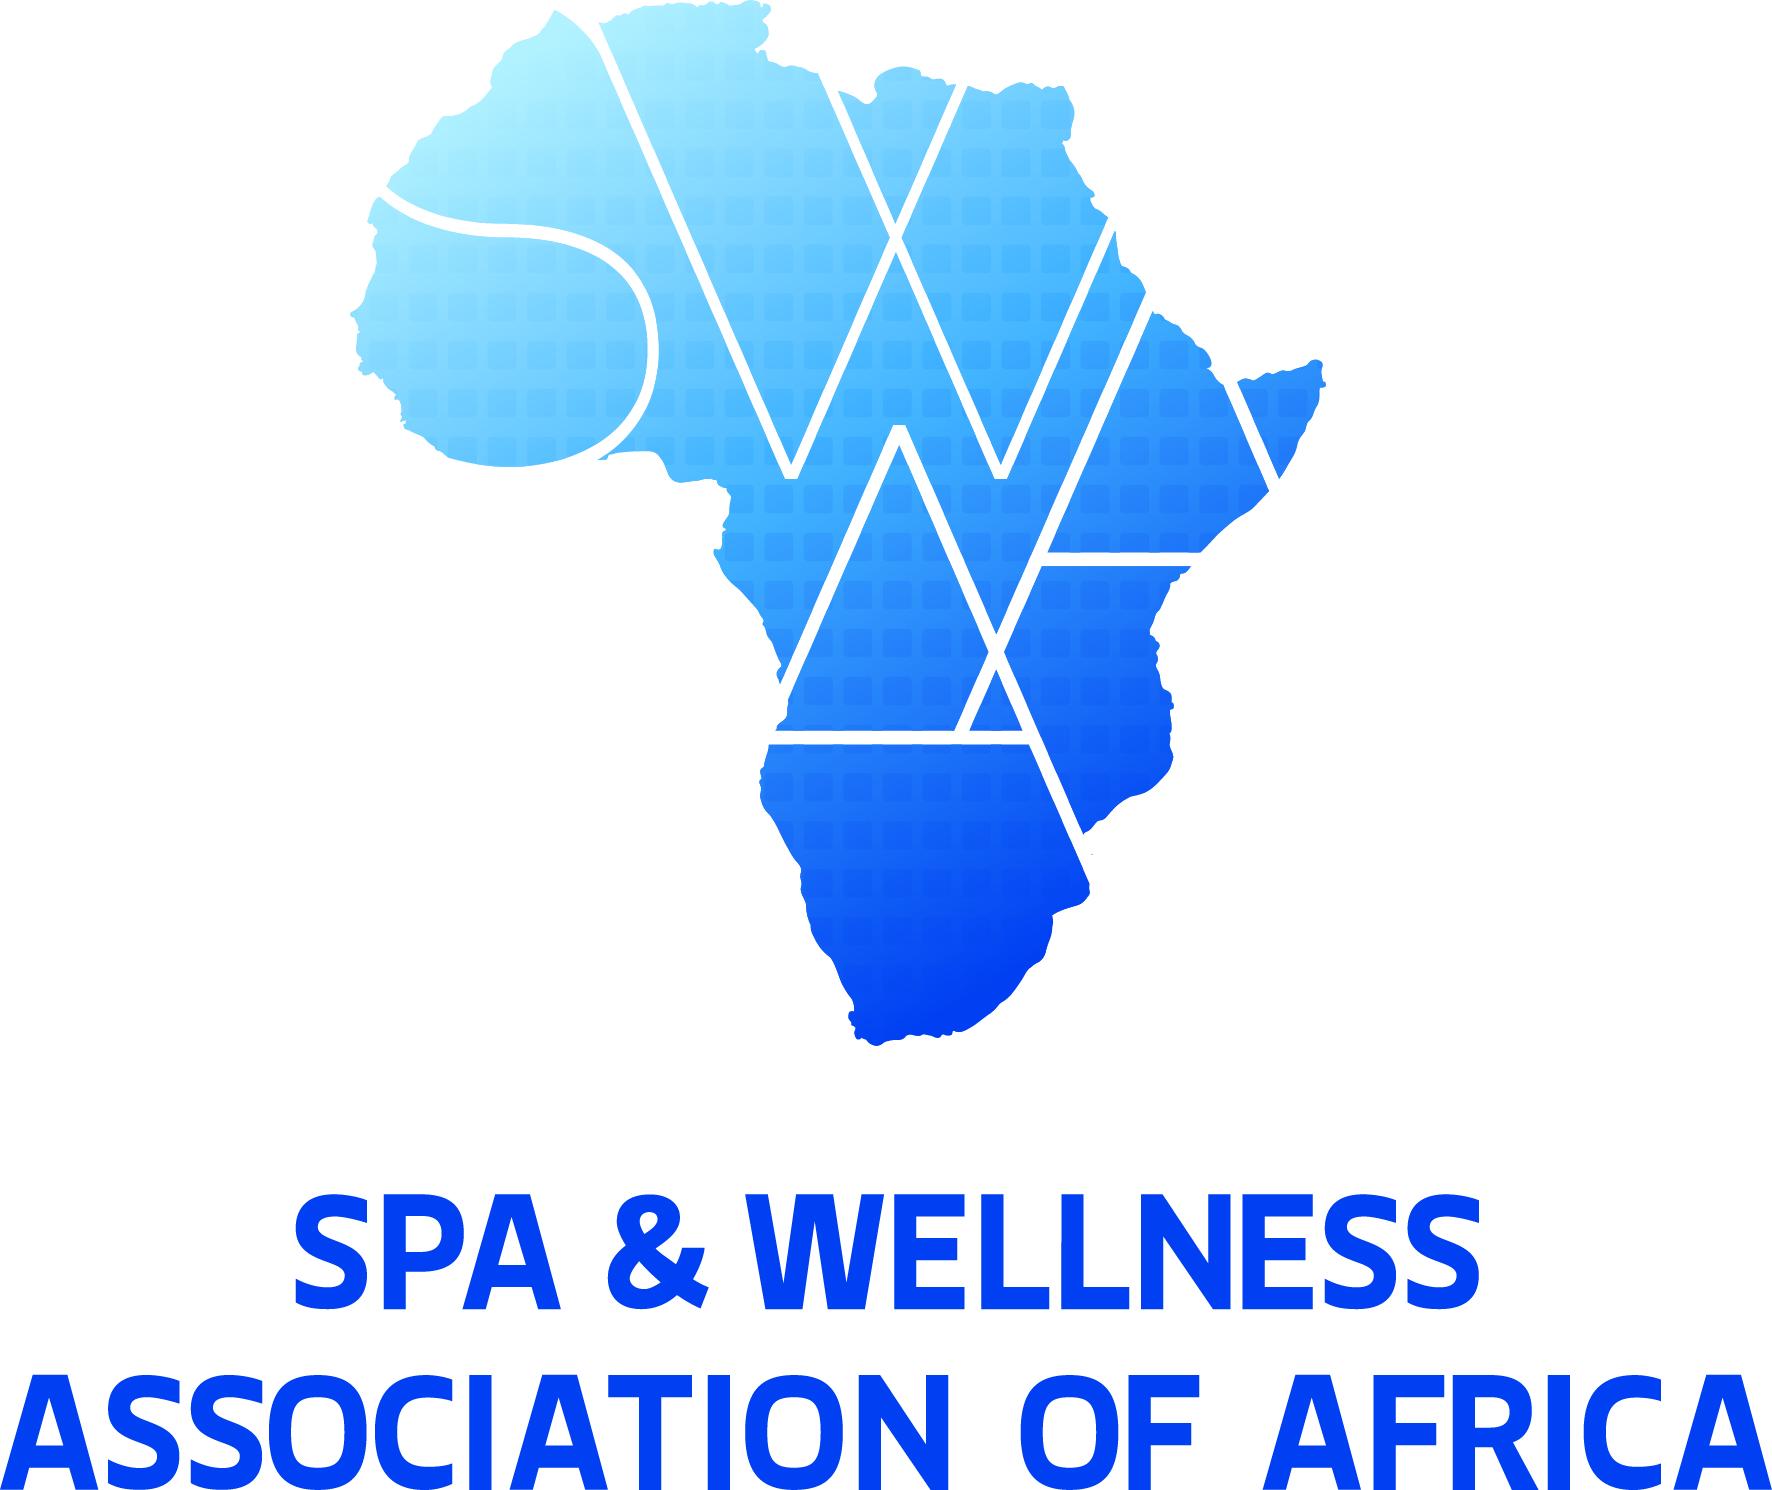 SPA & WELLNESS ASSOCIATION OF AFRICA, Mauritius